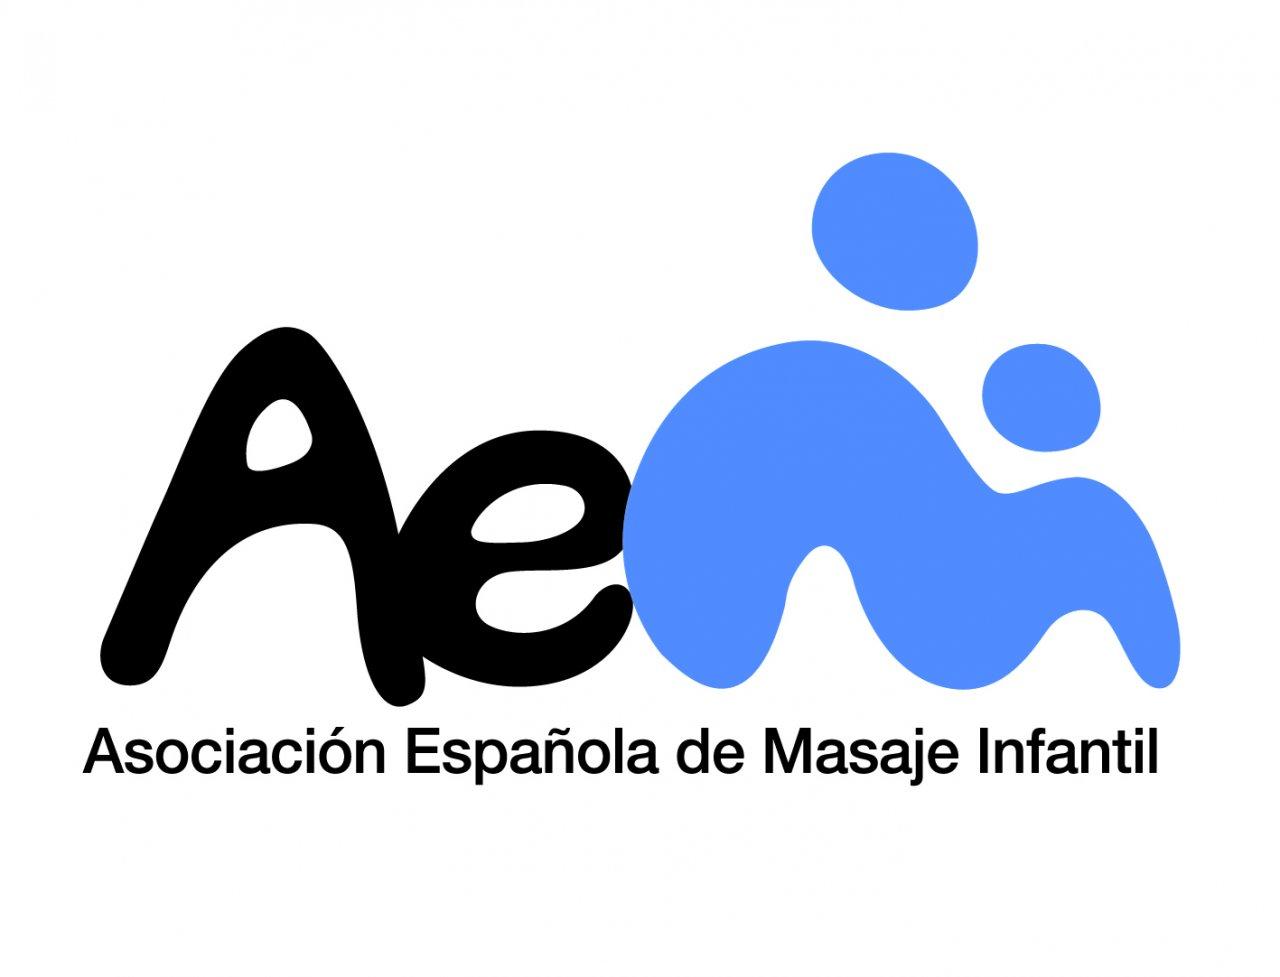 aemi - masaje infantil madrid